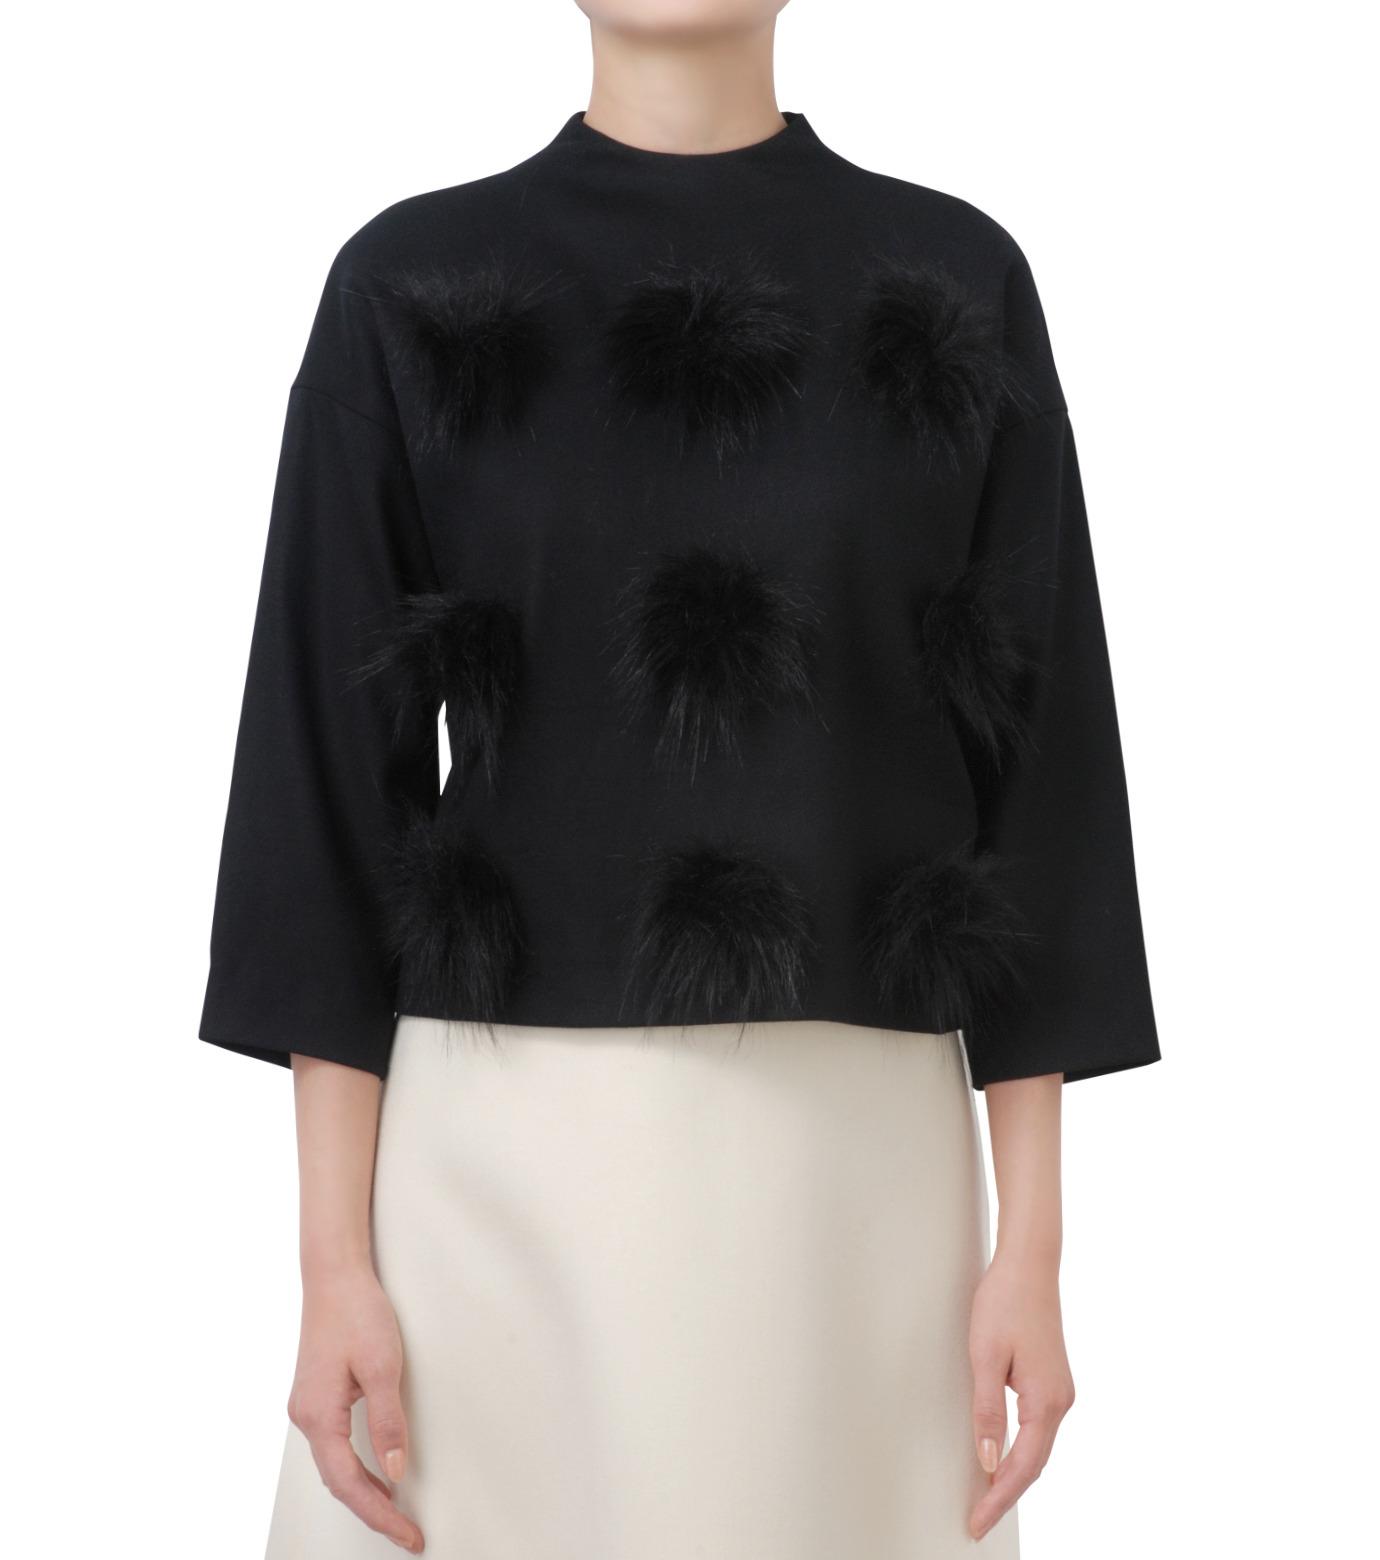 LE CIEL BLEU(ルシェルブルー)のフェイクファーポンポントップス-BLACK(シャツ/shirt)-17A63029 拡大詳細画像1